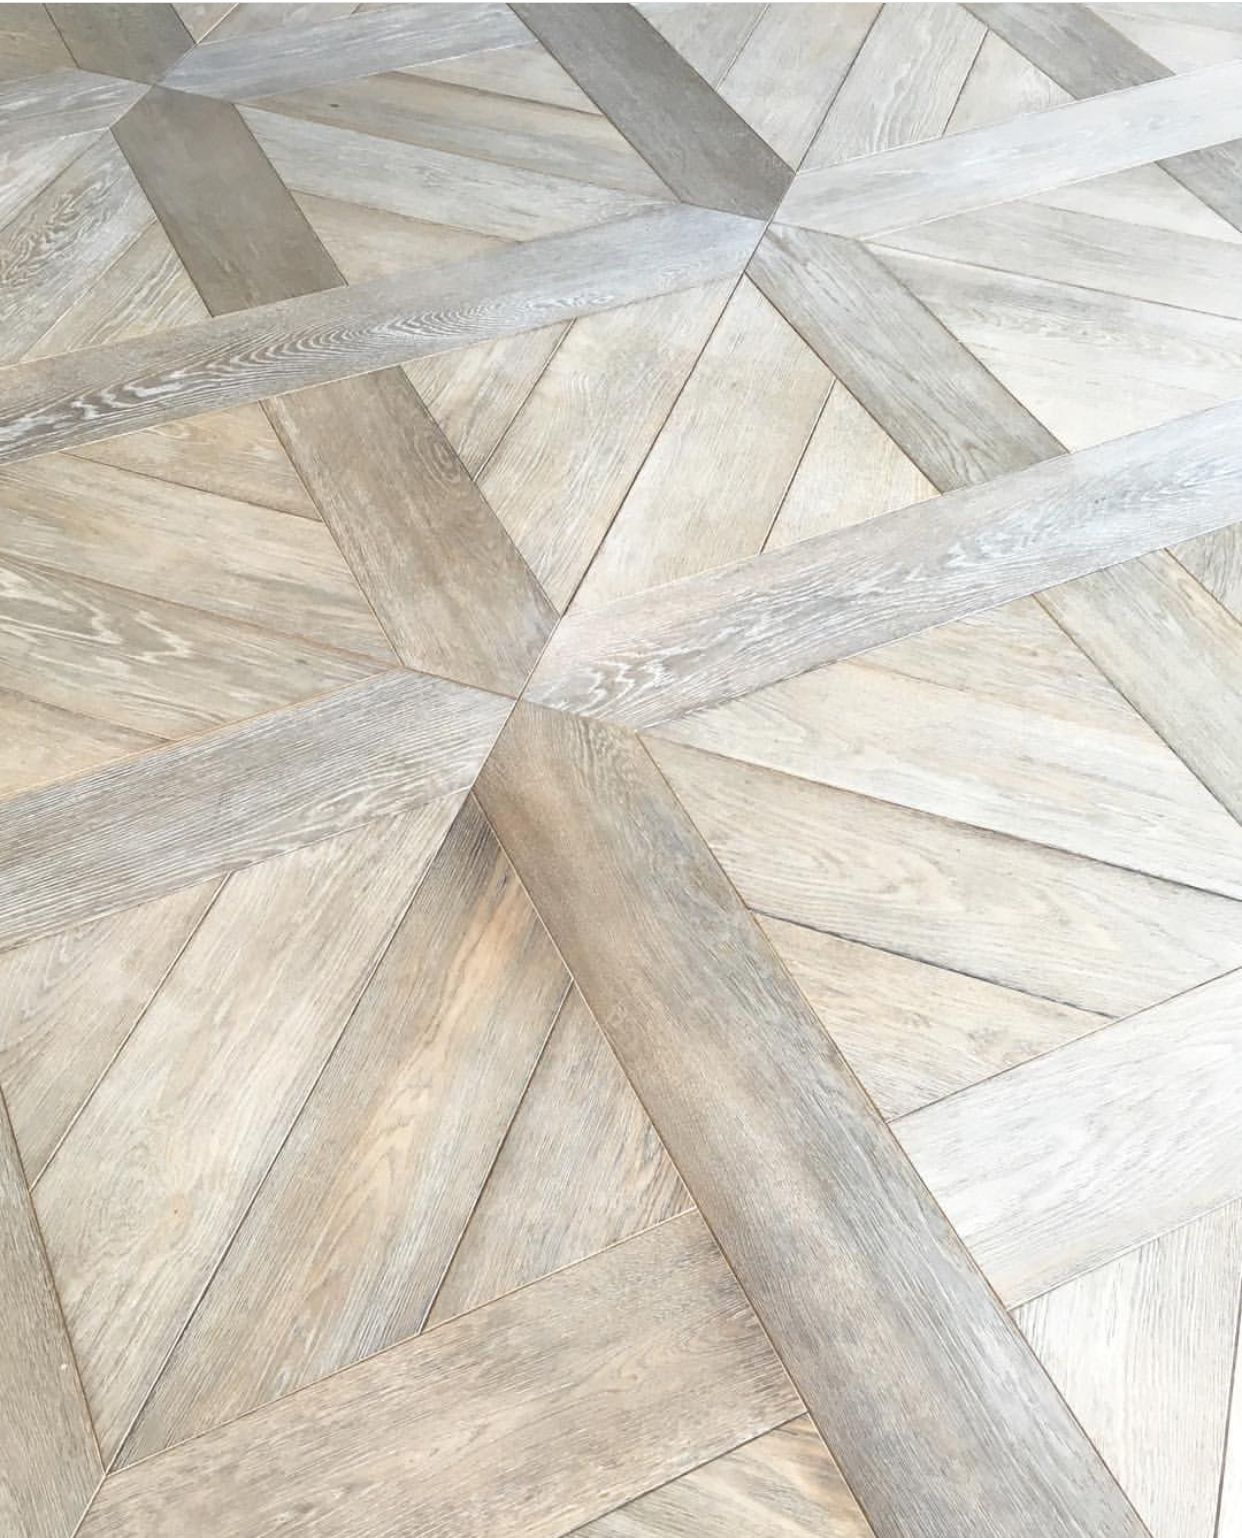 Pin By Carmen Corral On Wood Projects White Oak Floors Oak Floors Parquet Hardwood